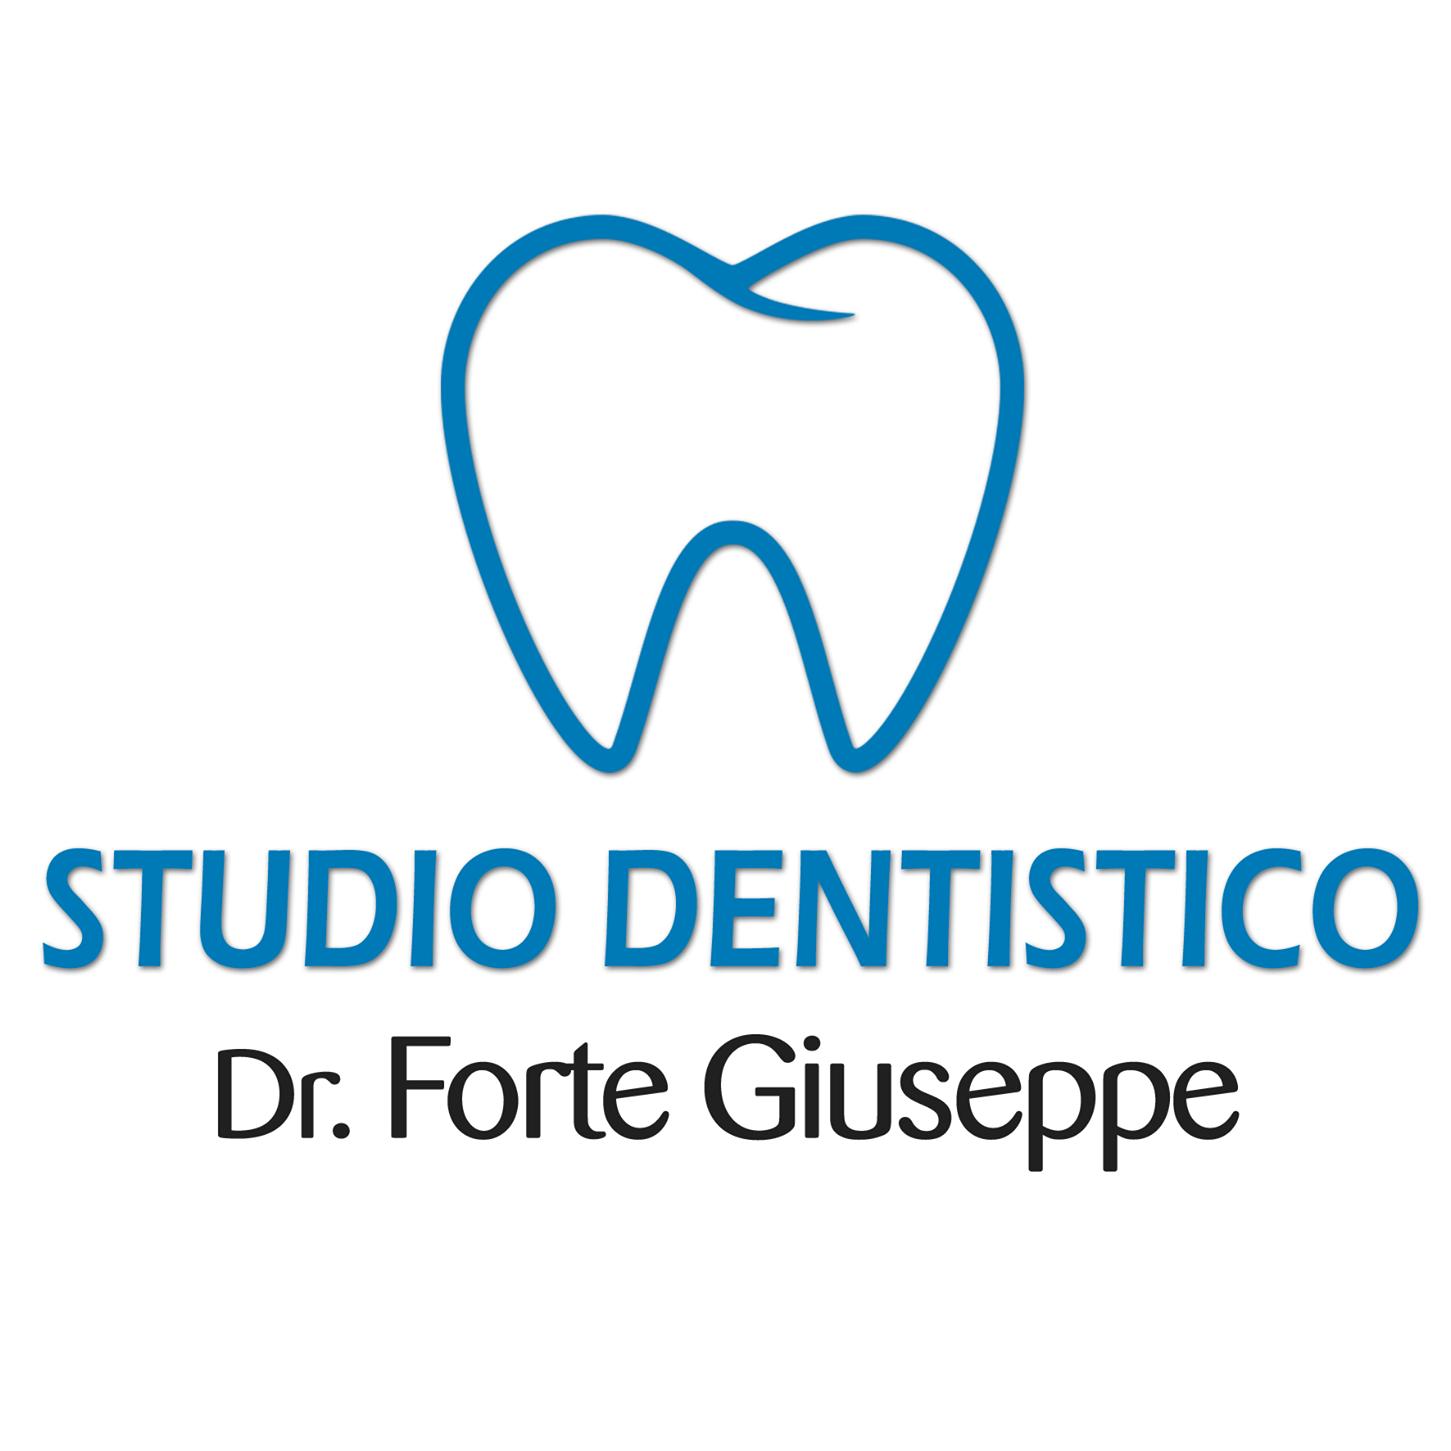 Studio Dentistico Dott. Giuseppe Forte